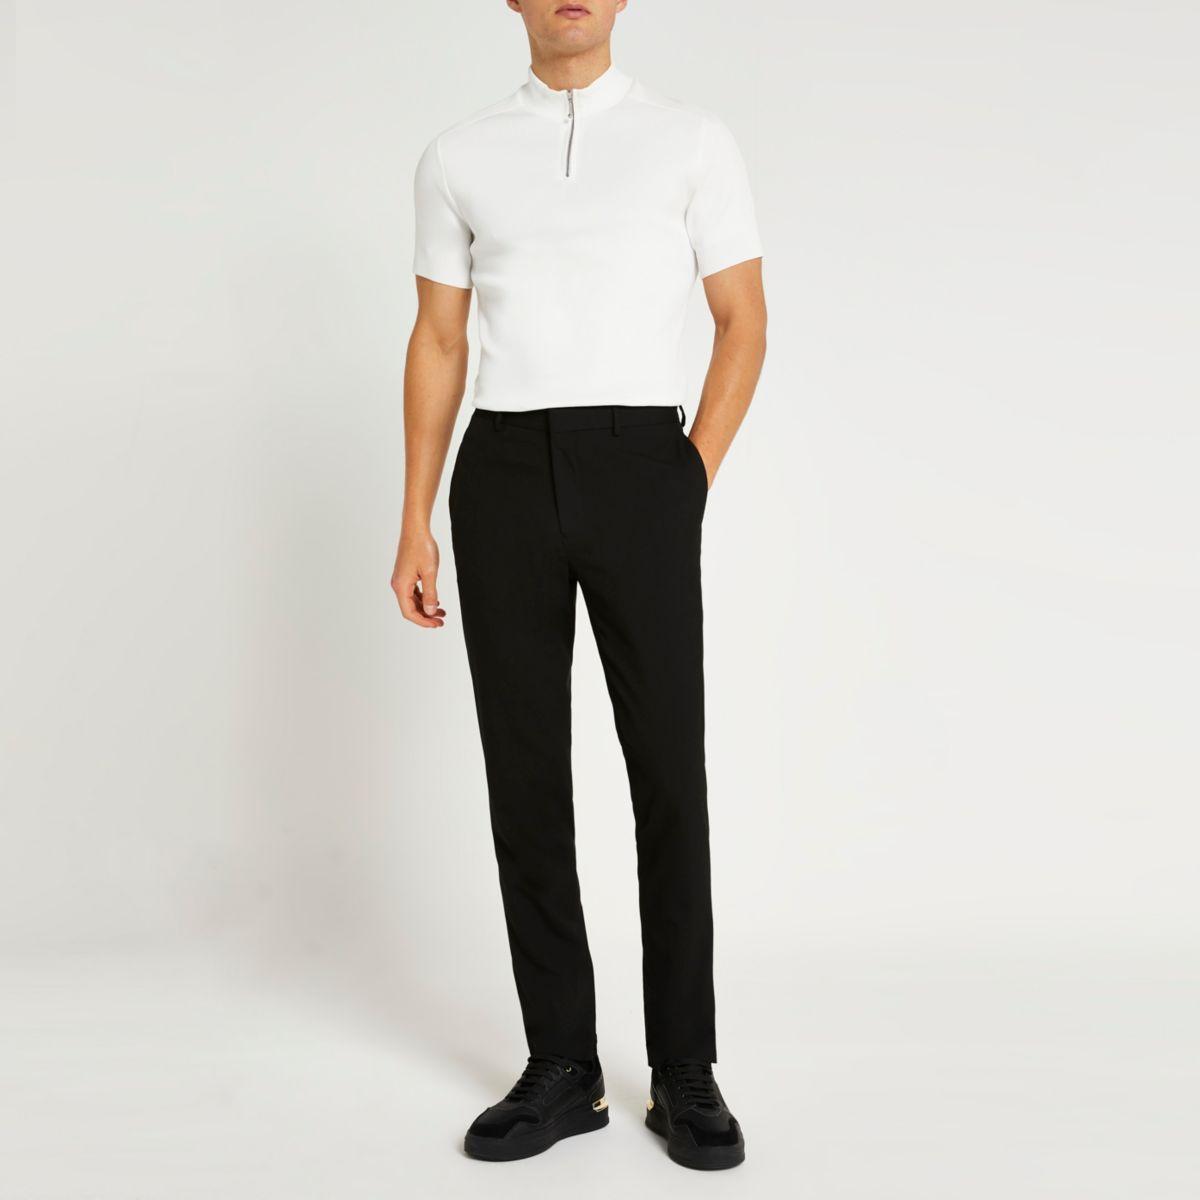 pantalon habill noir coupe slim pantalons habill s. Black Bedroom Furniture Sets. Home Design Ideas